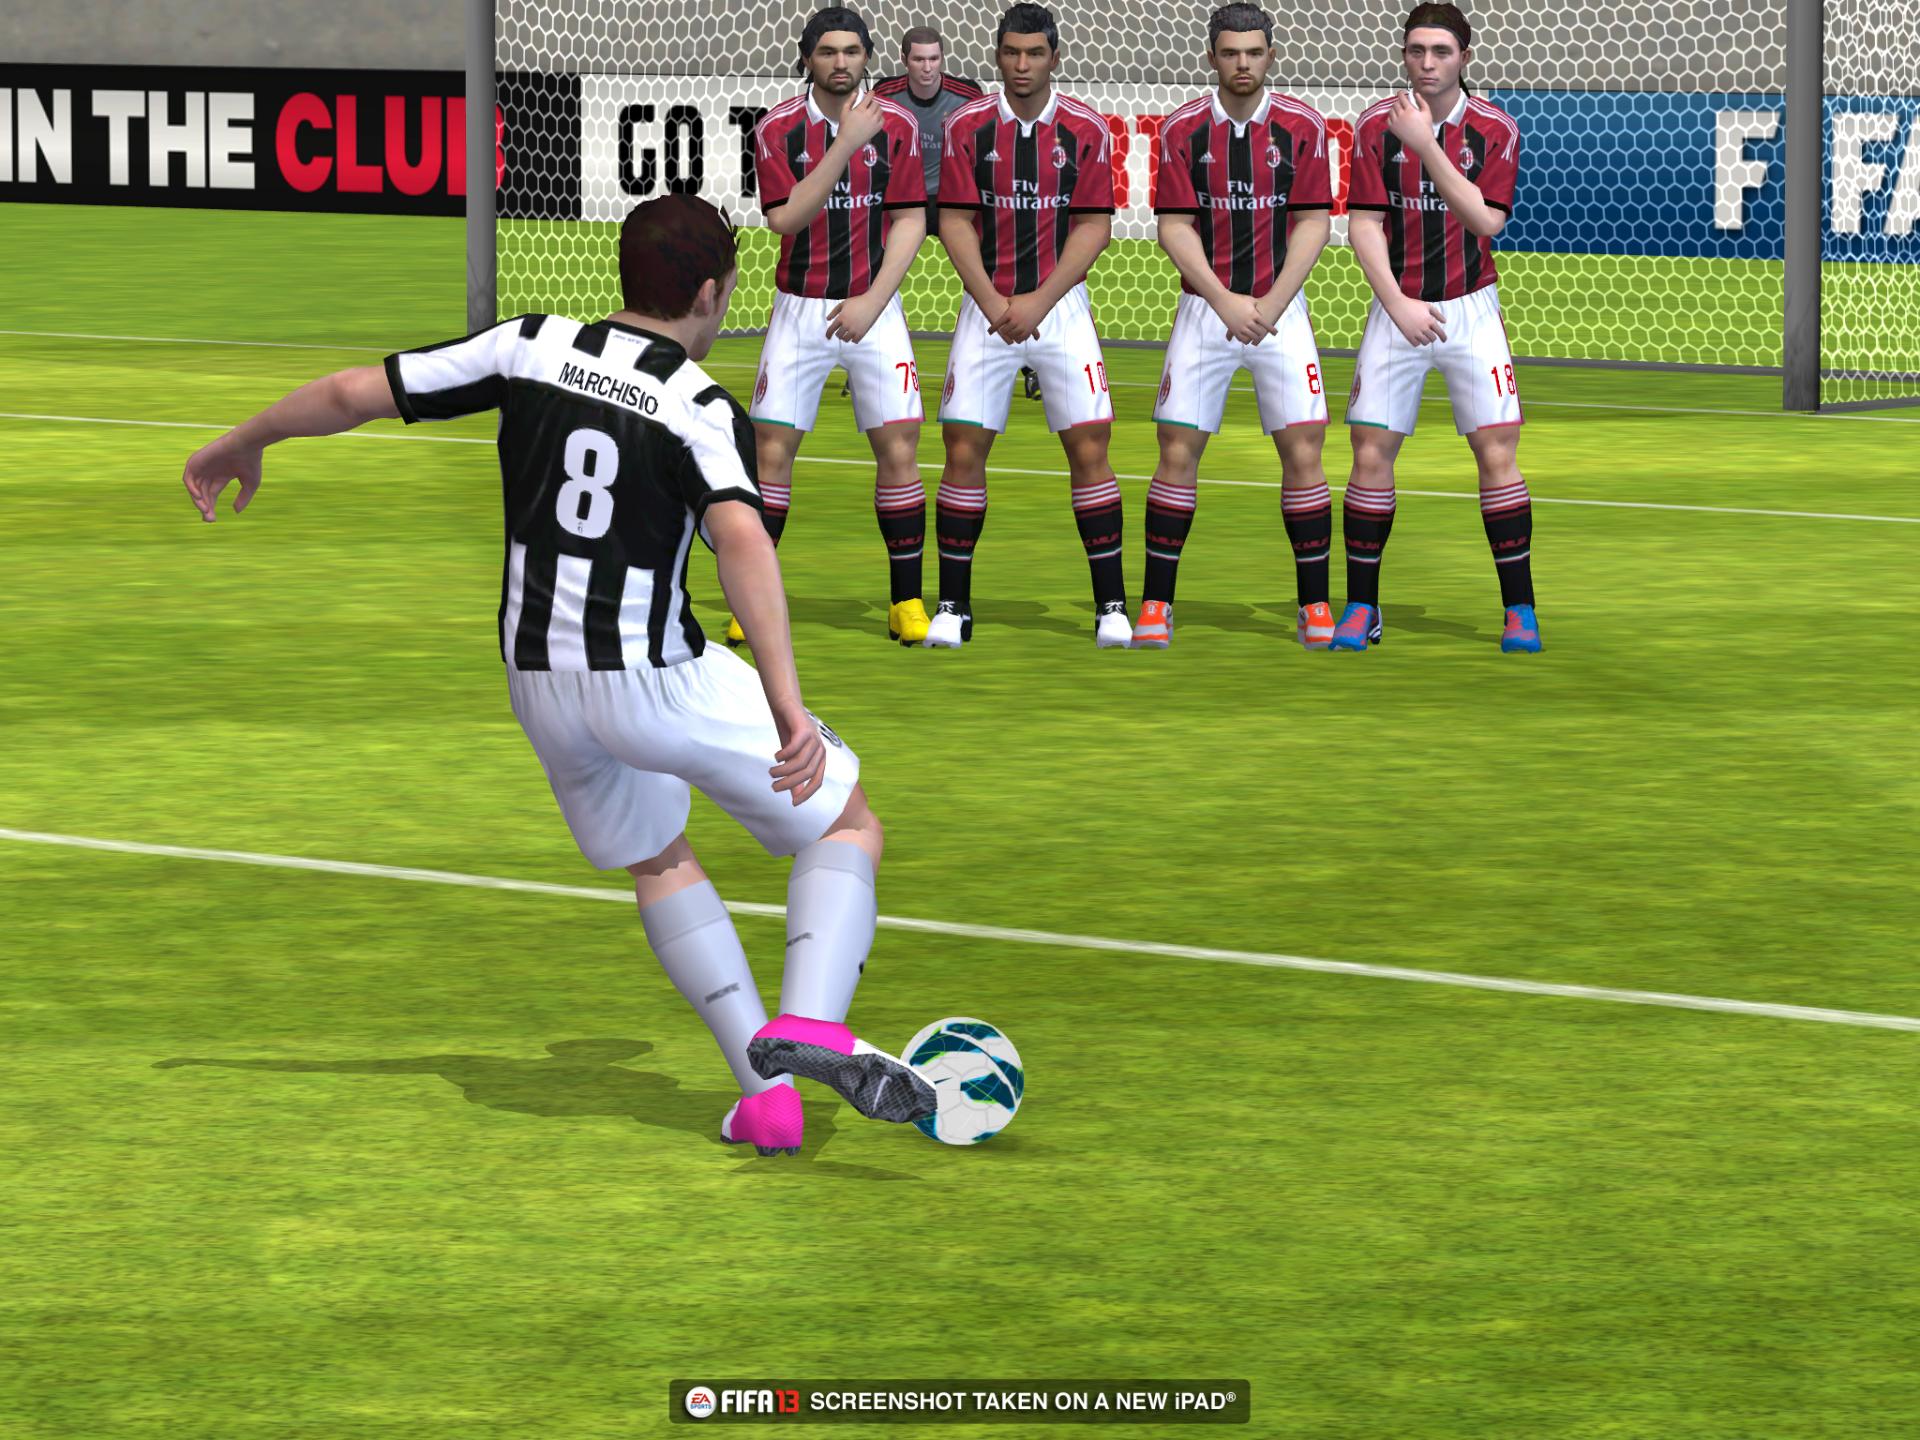 Obrázky z iOS verze FIFA 13 70827